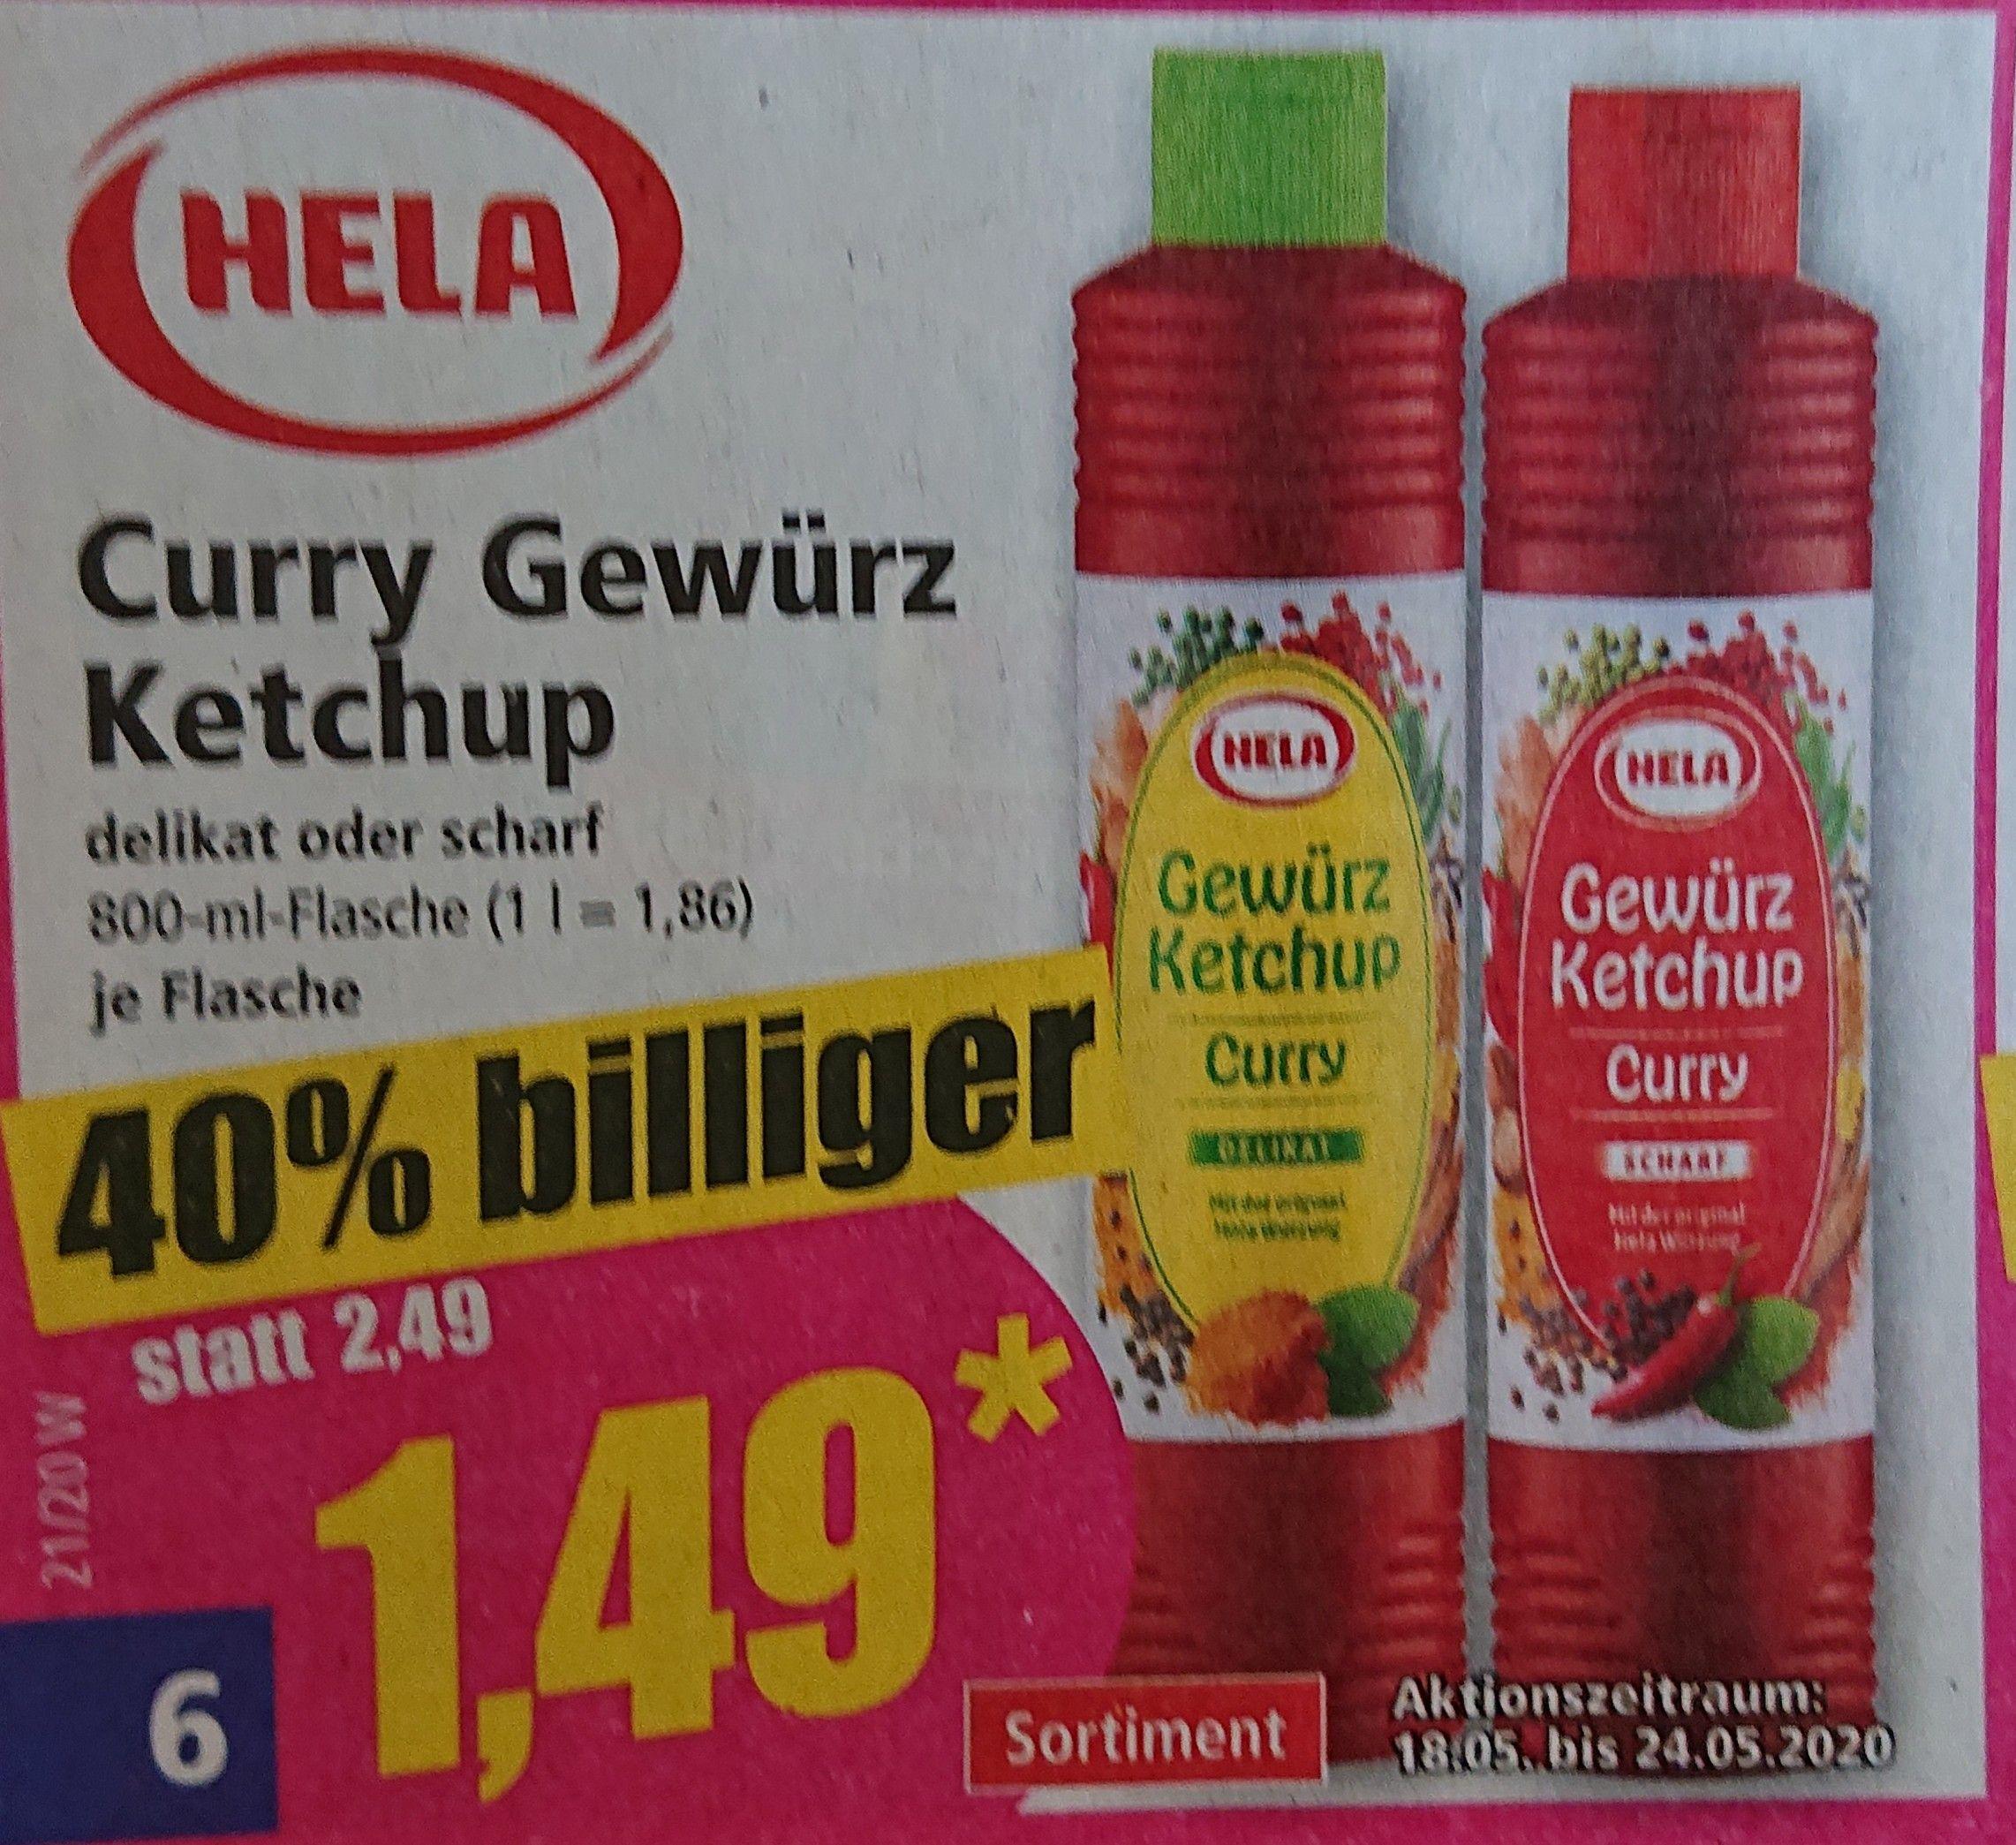 Hela Gewürz Ketchup 800/860 ml für 1,49 - 1,55 € [Norma] [Penny] [REWE] [18. - 23.05.]